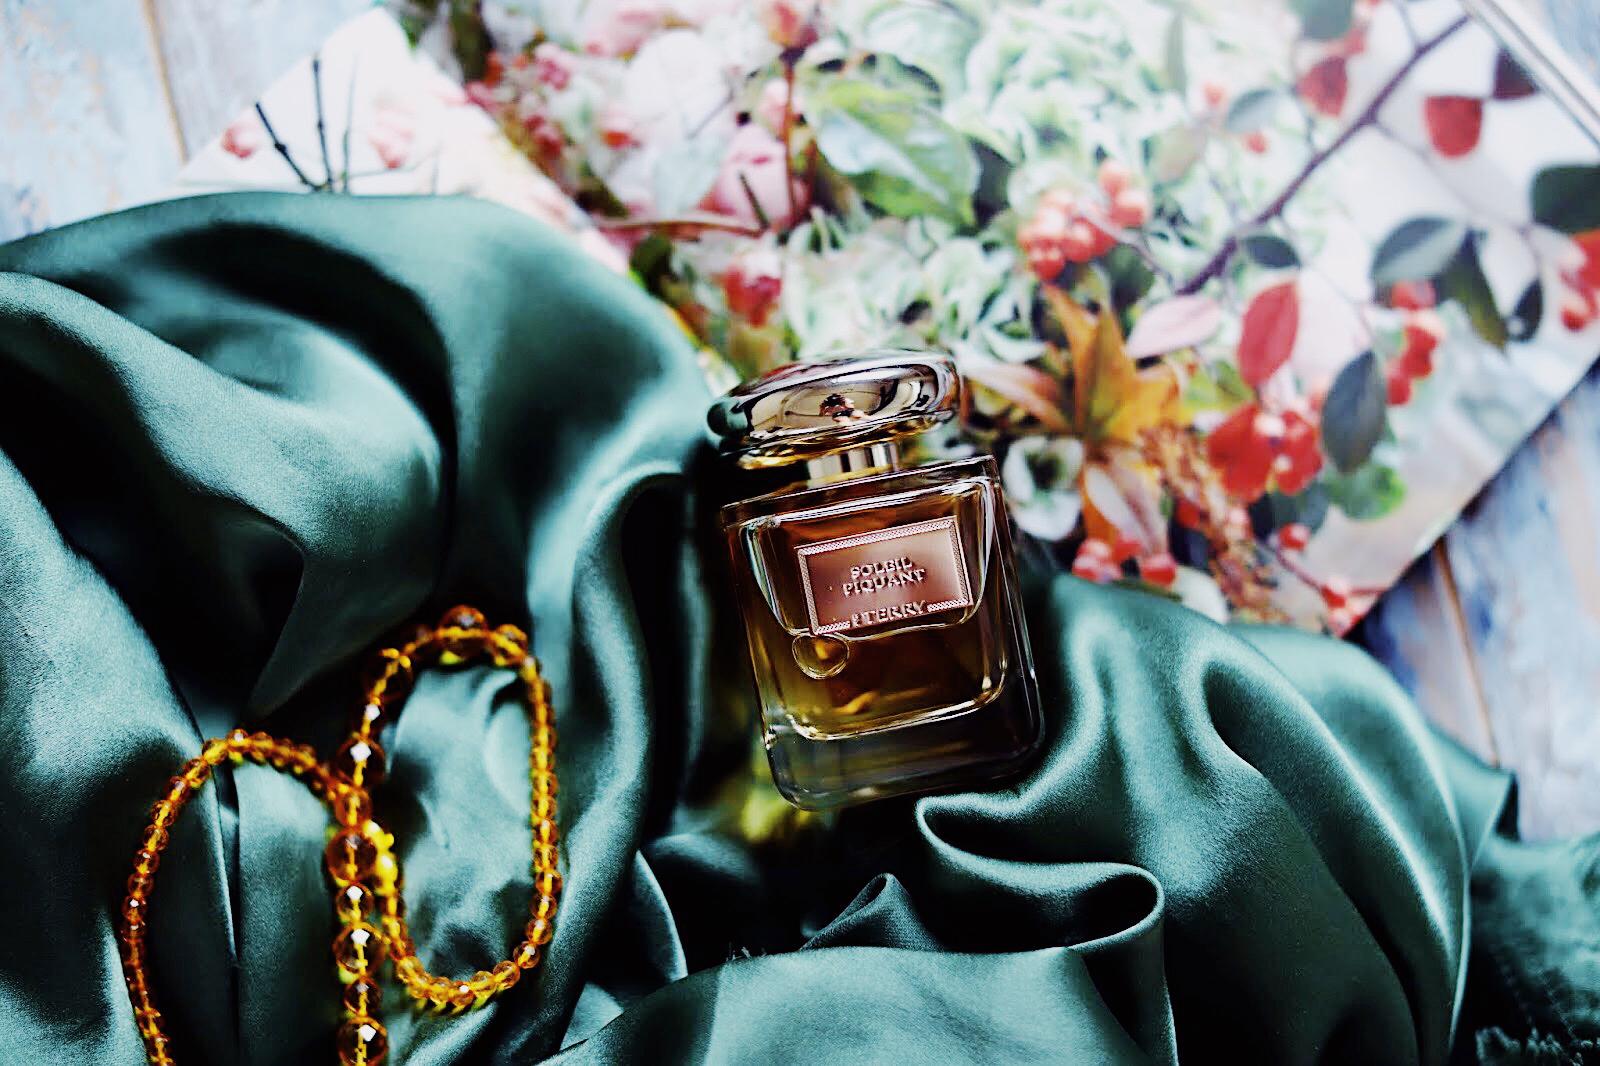 by terry soleil piquant parfum avis test